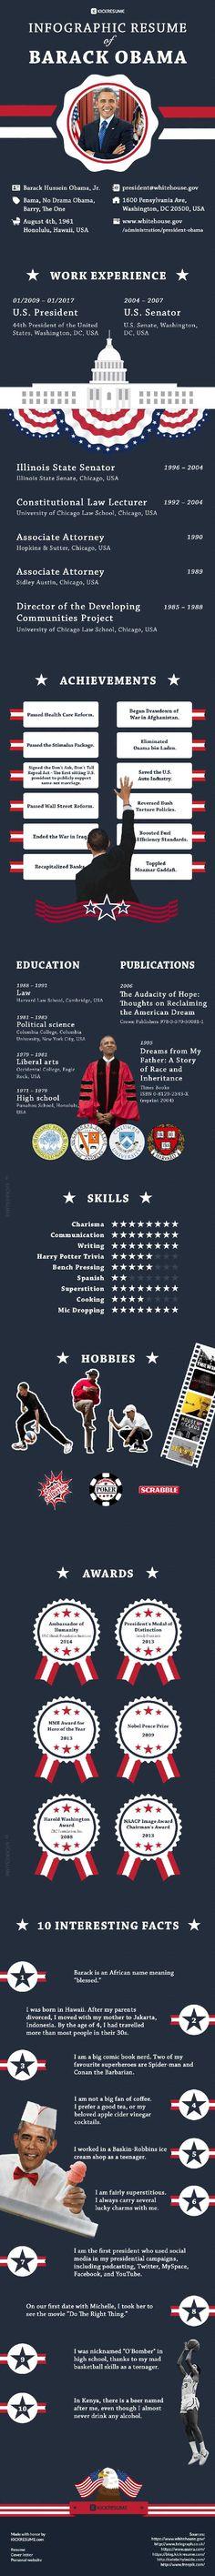 Beautiful minimalistic and infographic resume design by www - barack obama resume